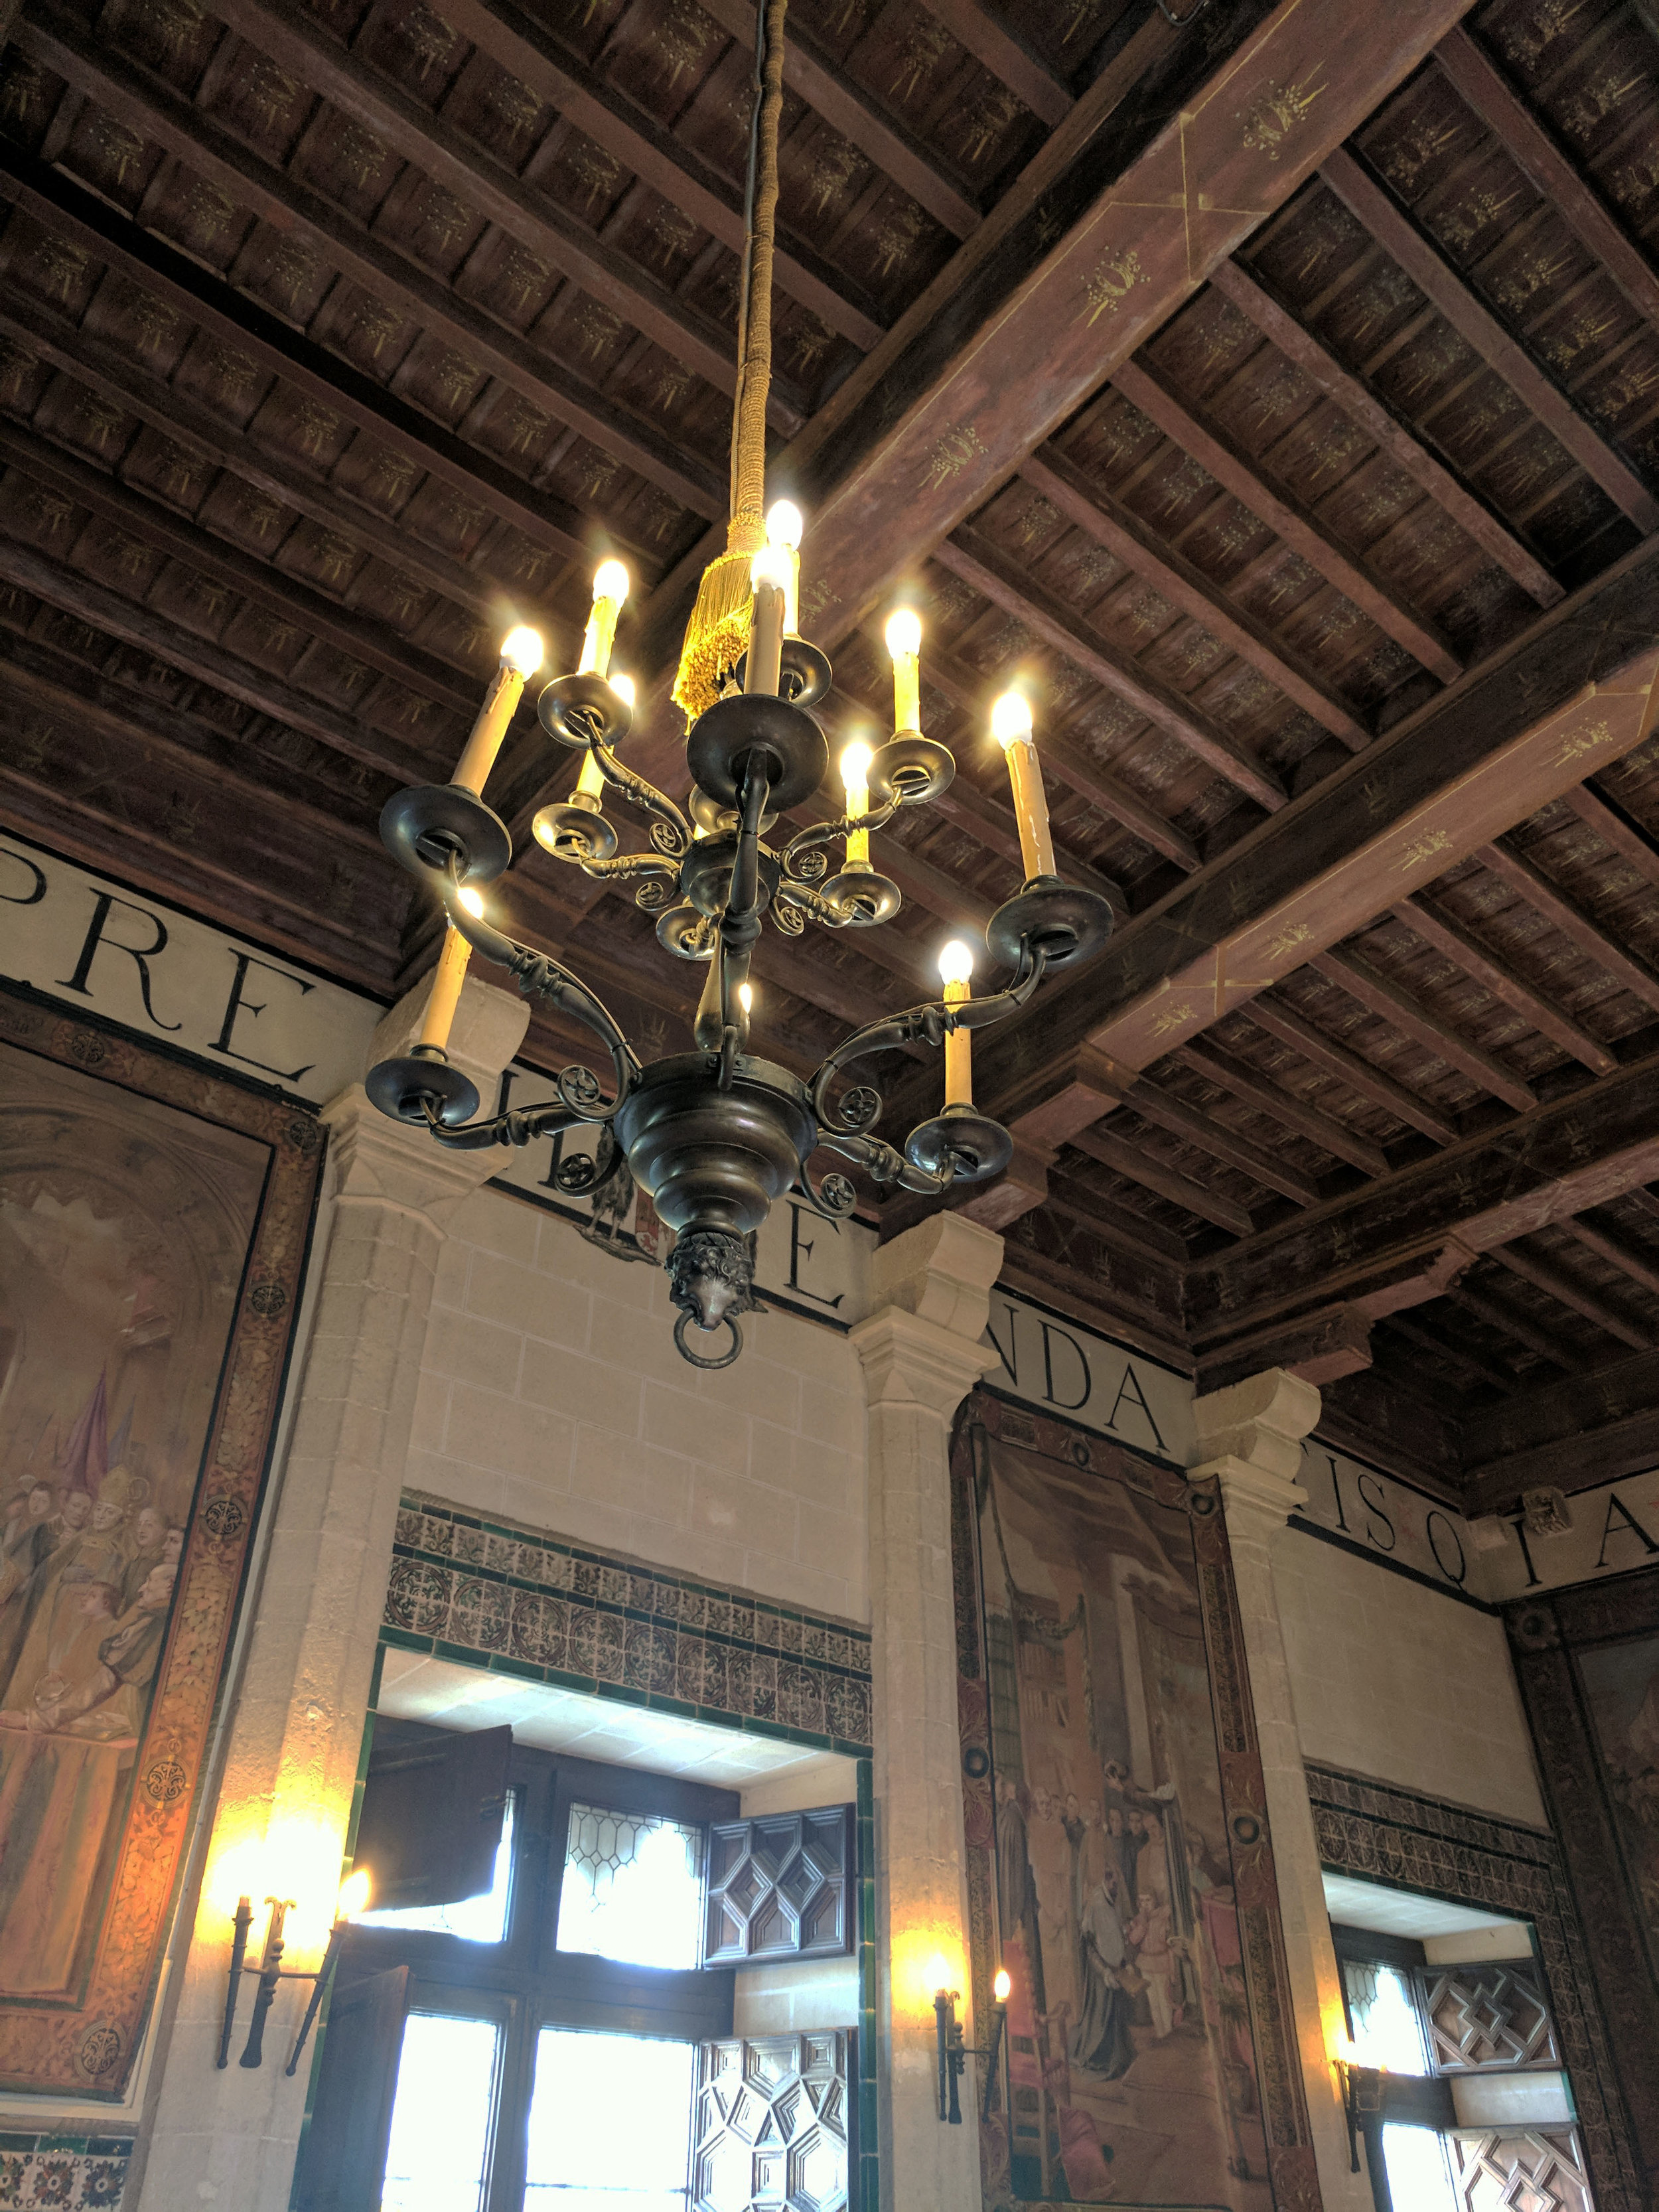 Inside Ducal Palace Ceiling.jpg